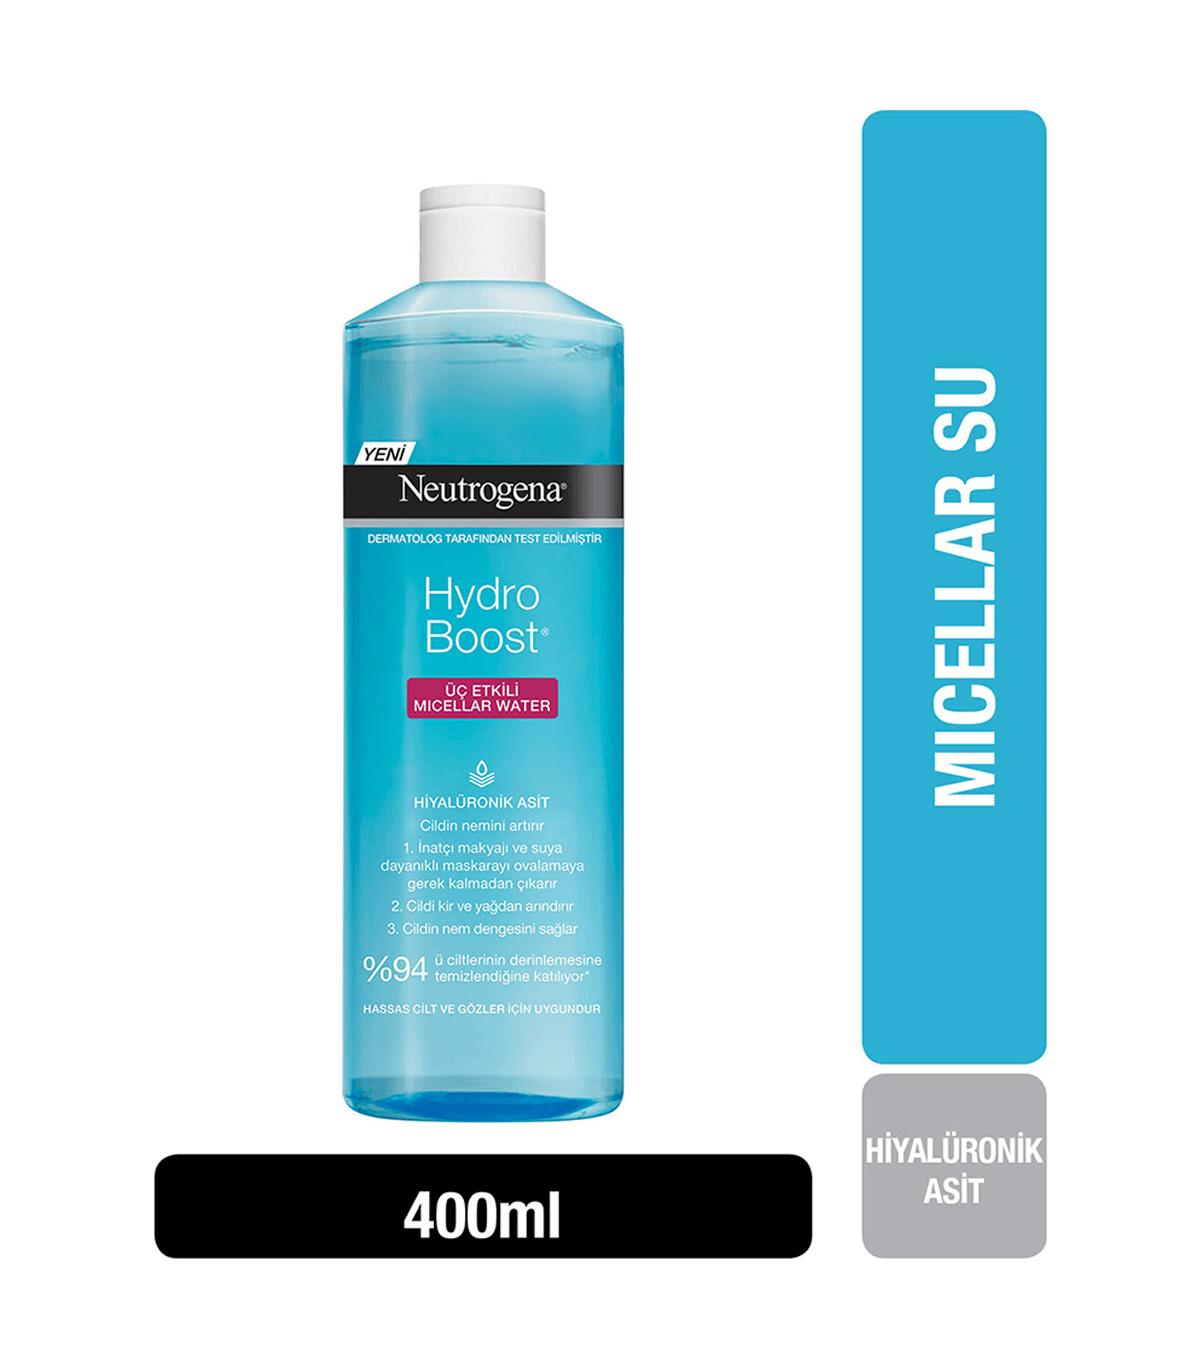 Neutrogena میسلار واتر آب رسان 400 میل نوتروژینا